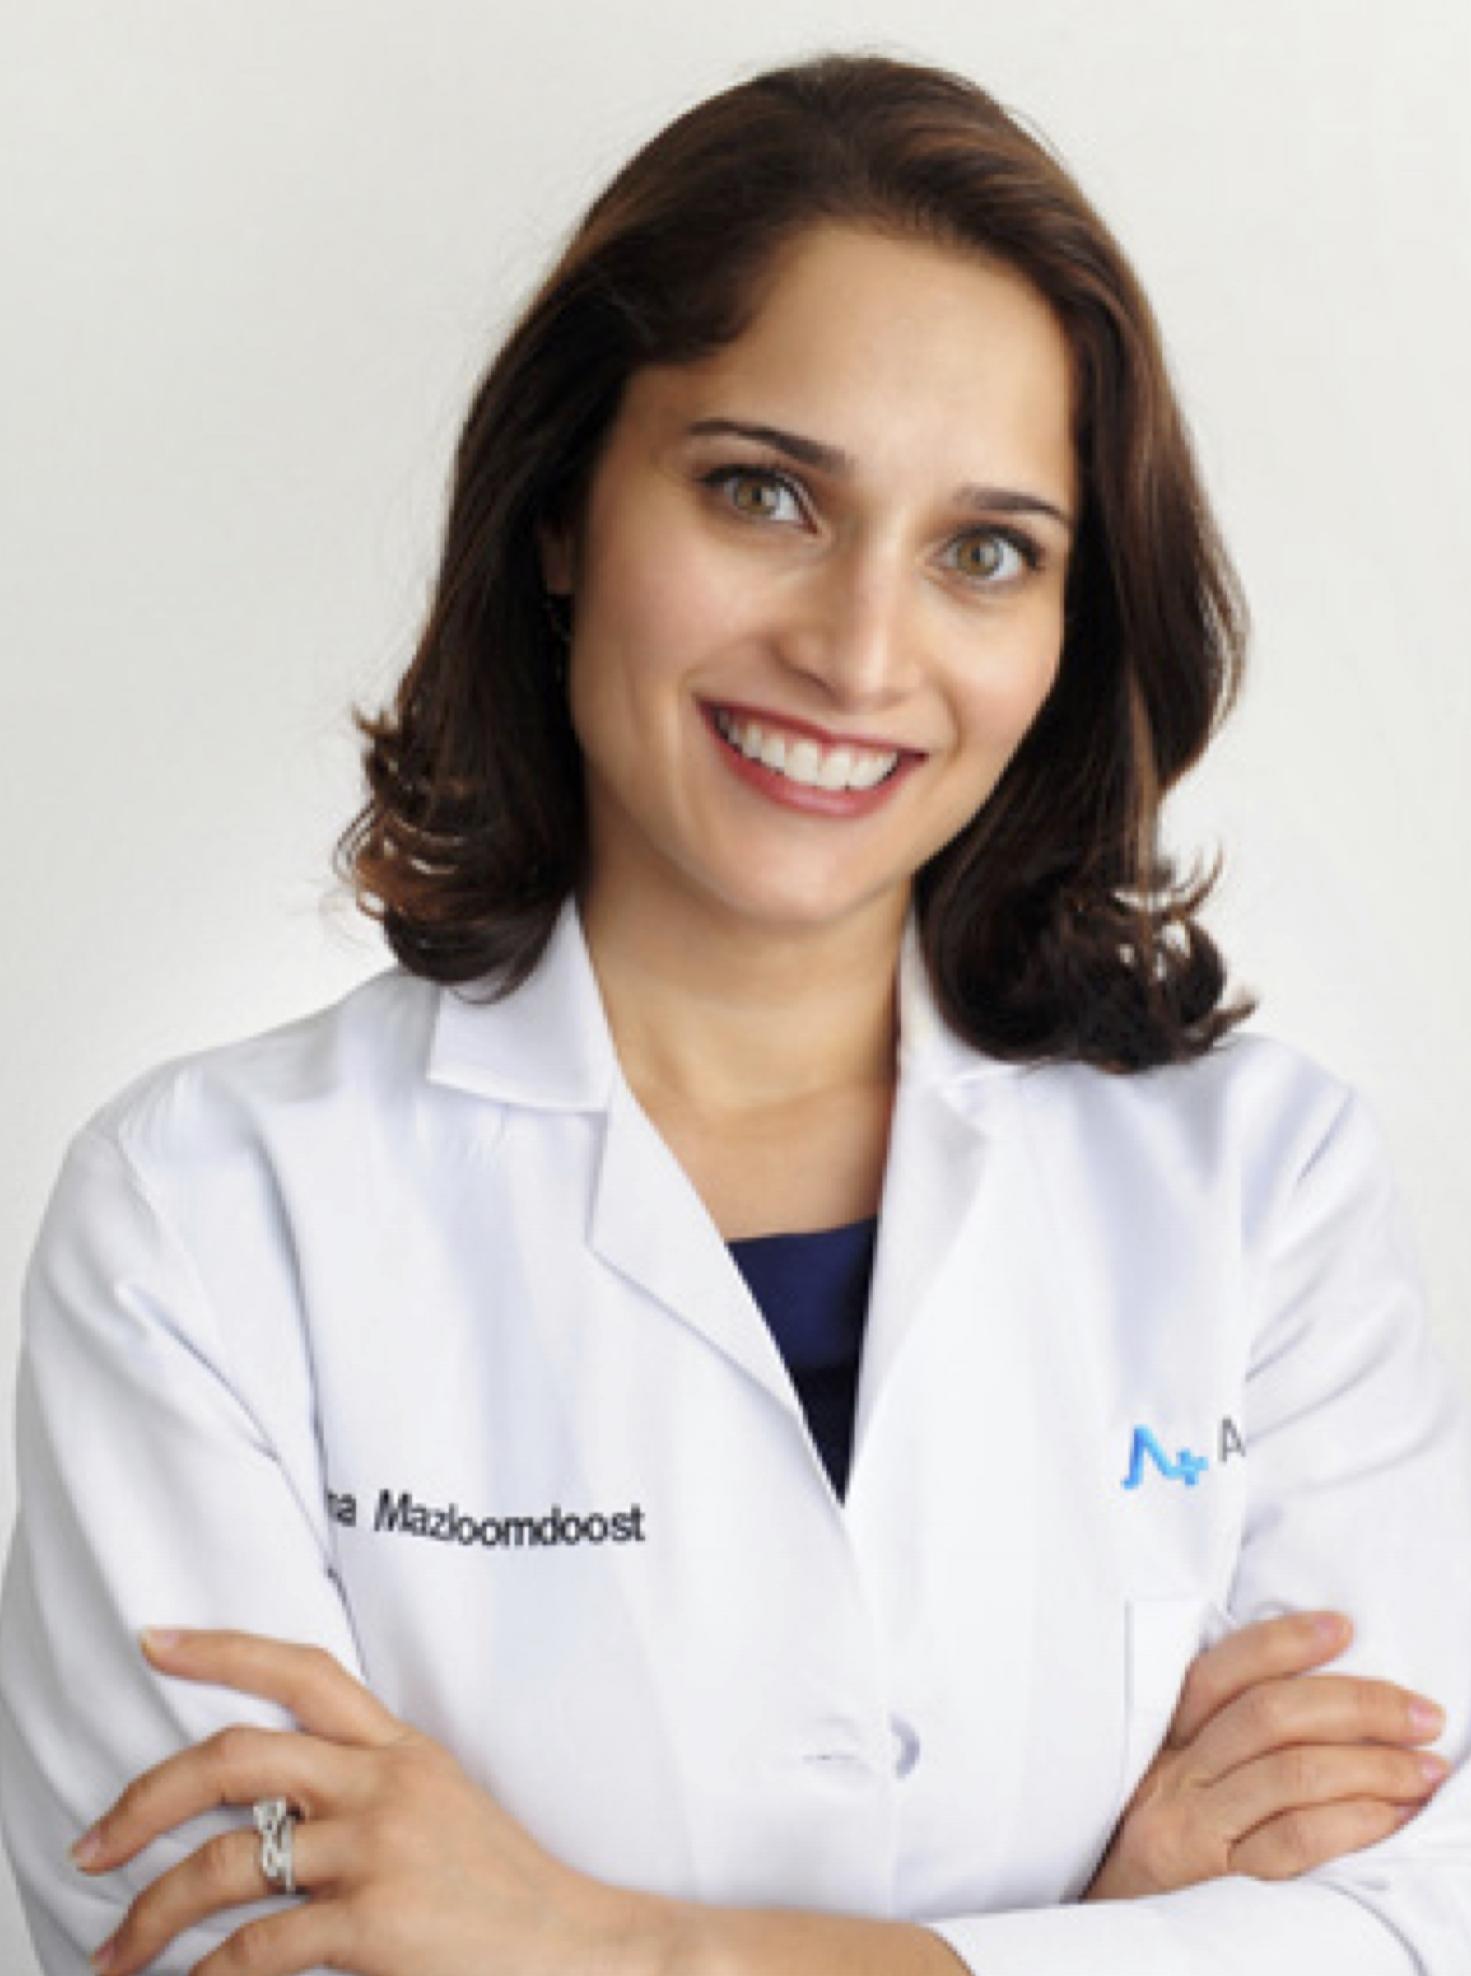 Donna Mazloomdoost, MD, FACOG